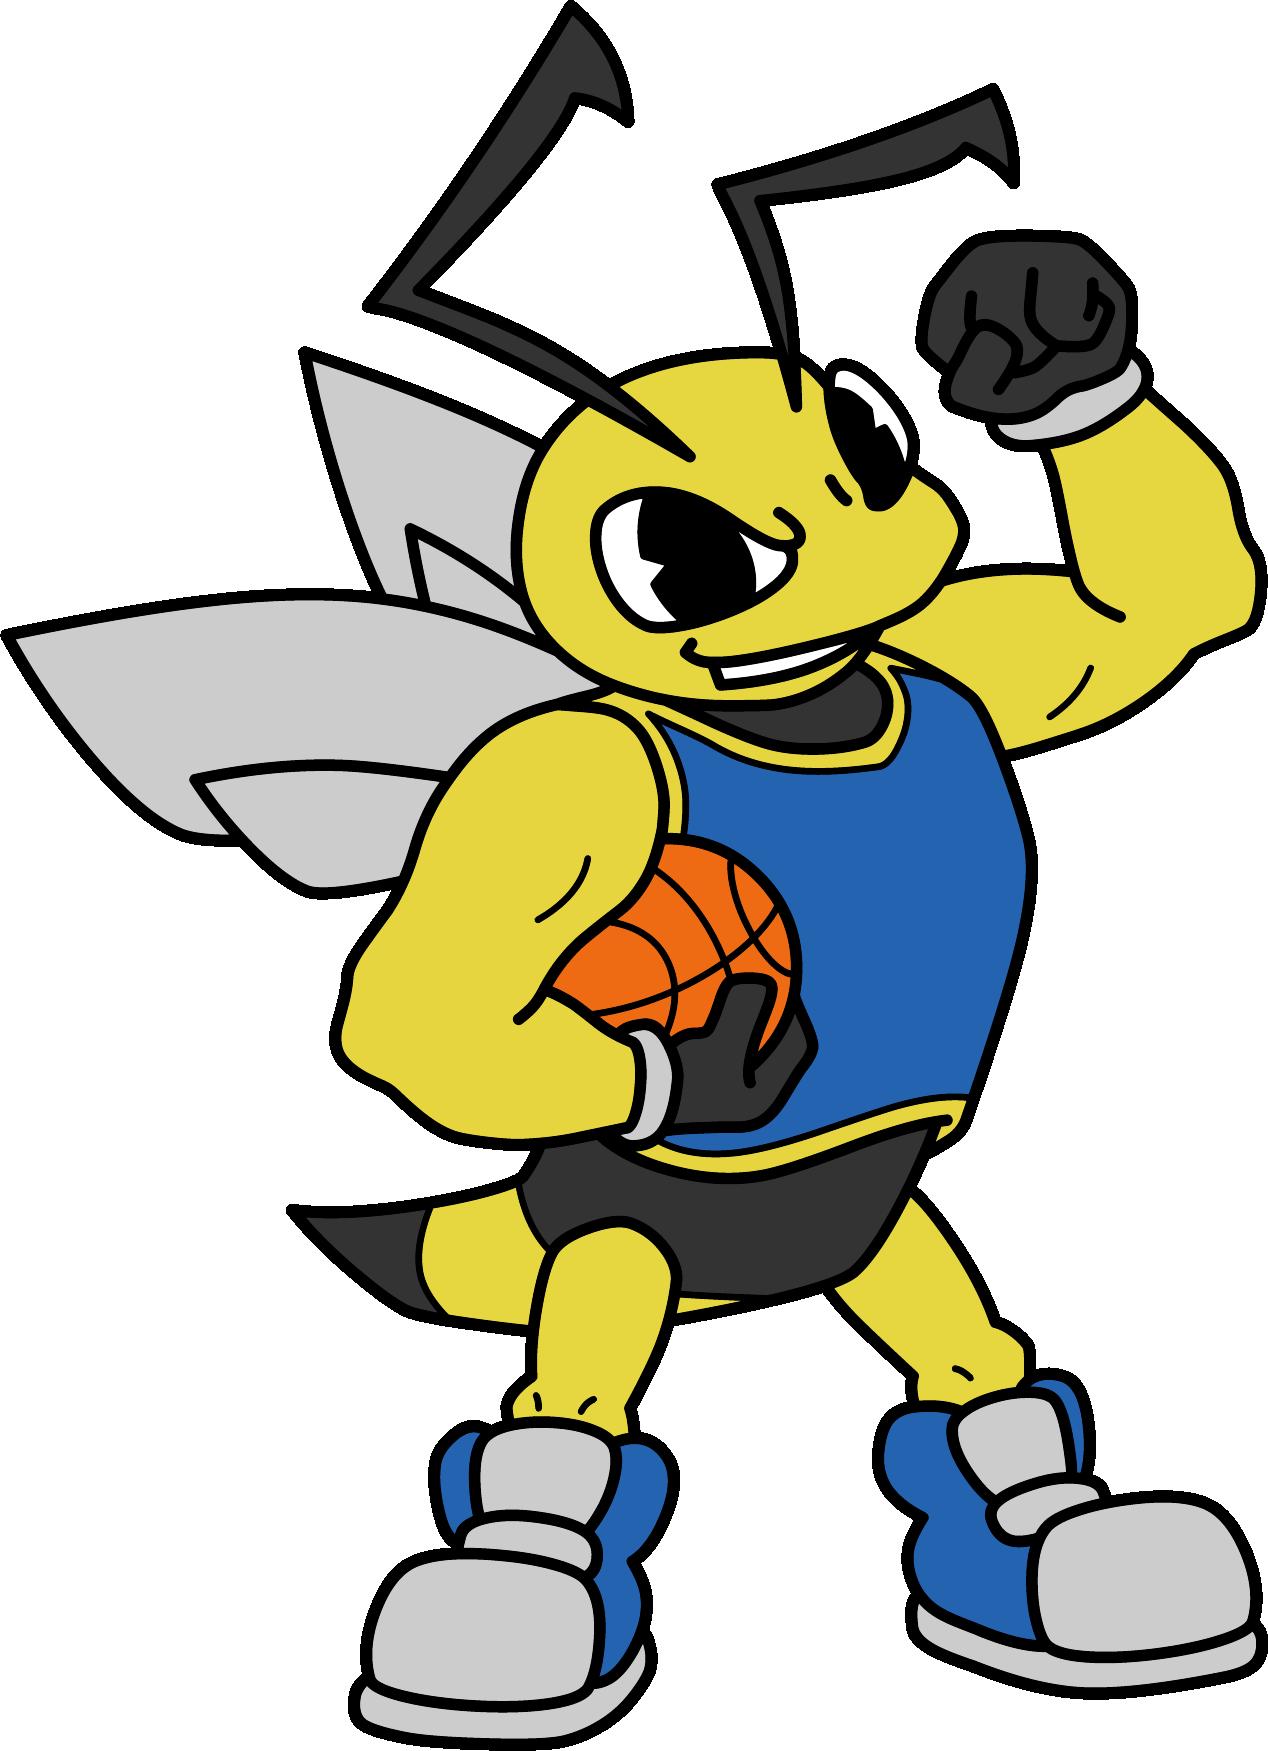 Ebees - Mascot